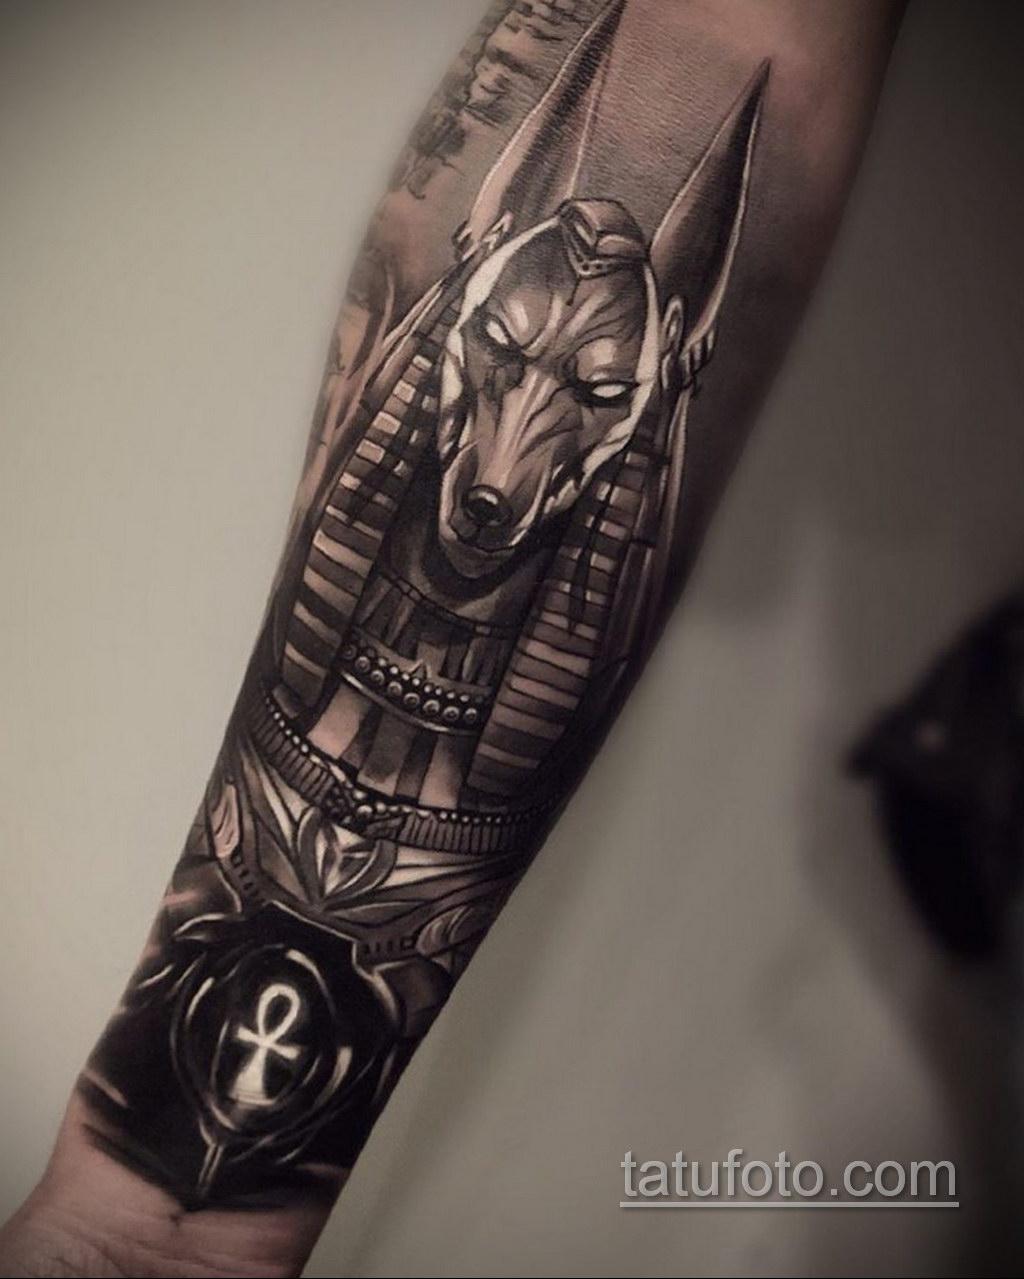 Фото анубис тату на предплечье 25.10.2020 №015 -forearm tattoo- tatufoto.com